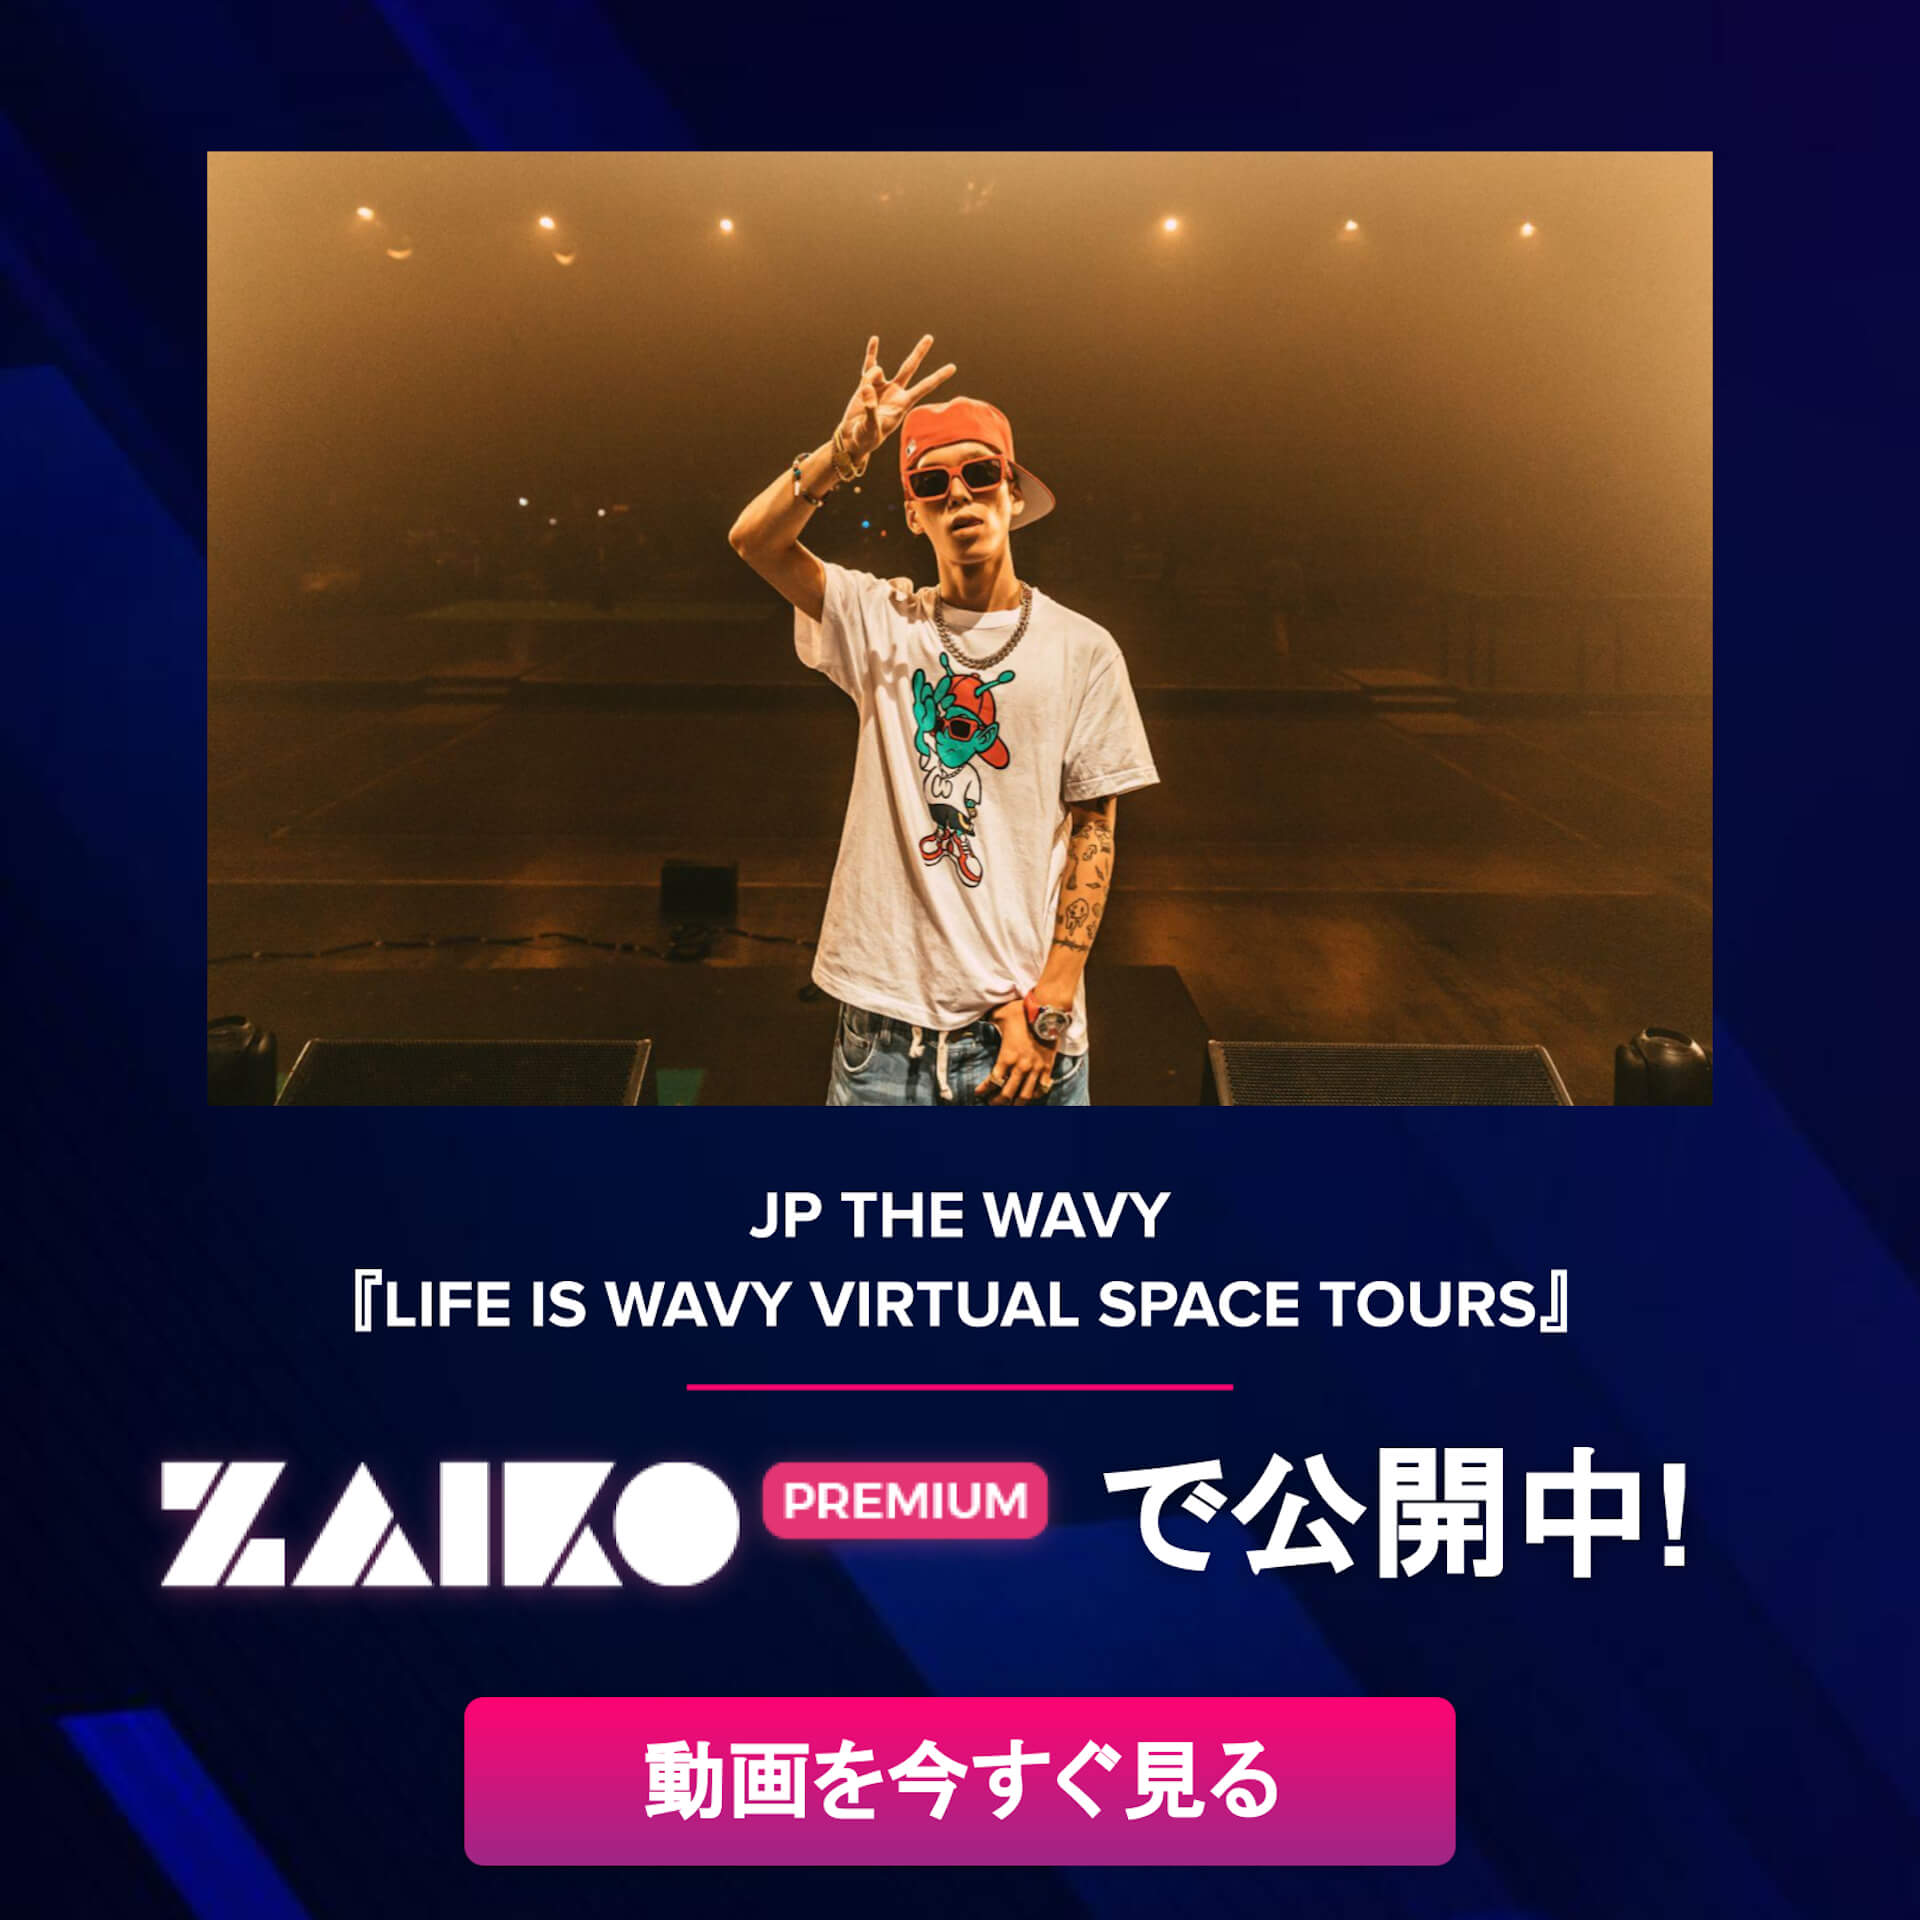 JP THE WAVYのクラブツアー東京公演がVISIONで開催決定!初のオンラインライブノーカット映像がZAIKOで独占配信中 music210621_jpthewavy_live_3